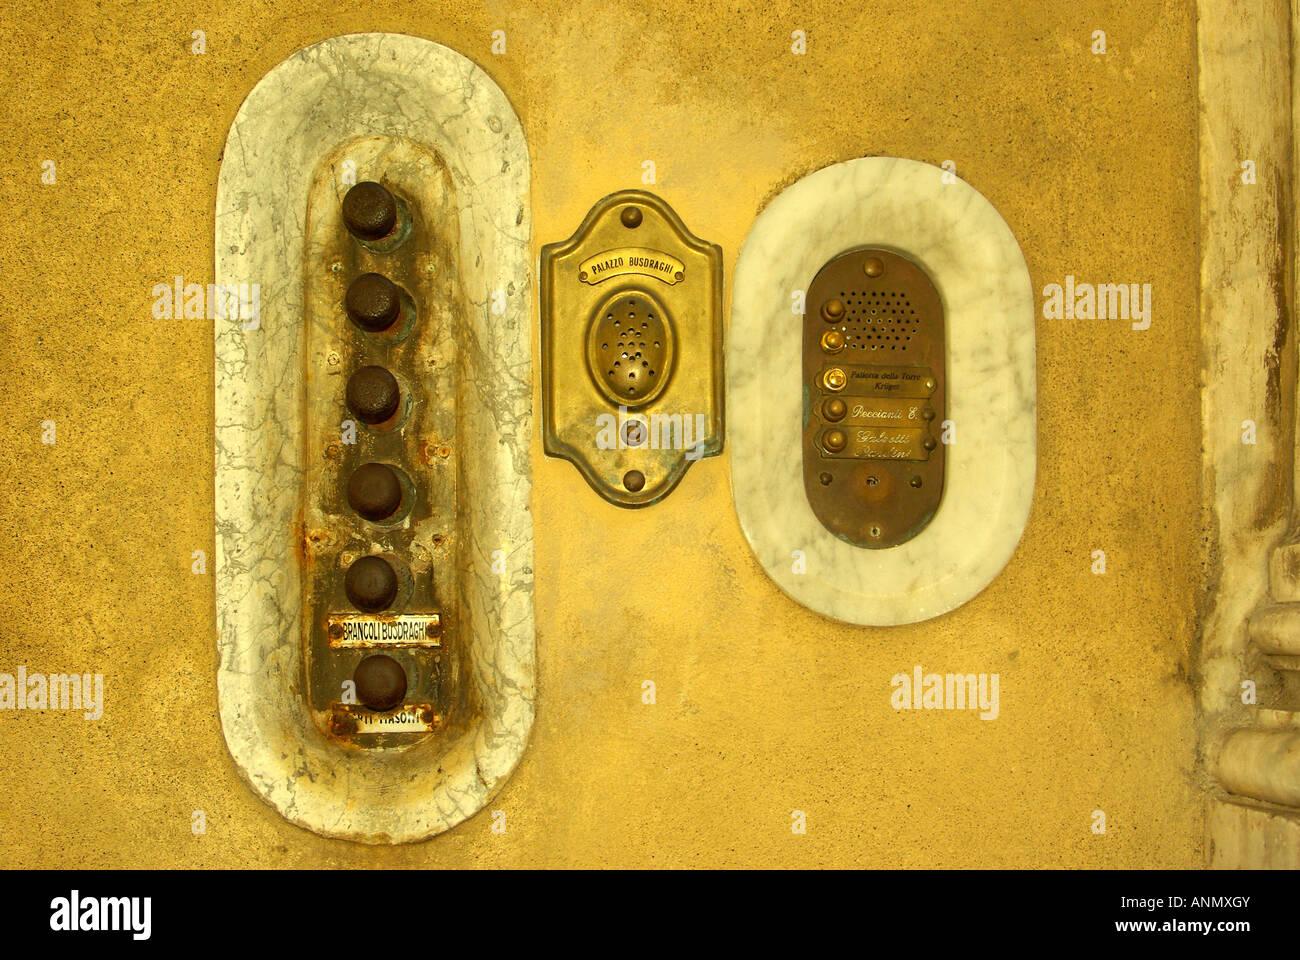 Old brass door buzzers and intercom in Lucca Tuscany Italy - Stock Image & Brass Door Ringer Stock Photos \u0026 Brass Door Ringer Stock Images - Alamy